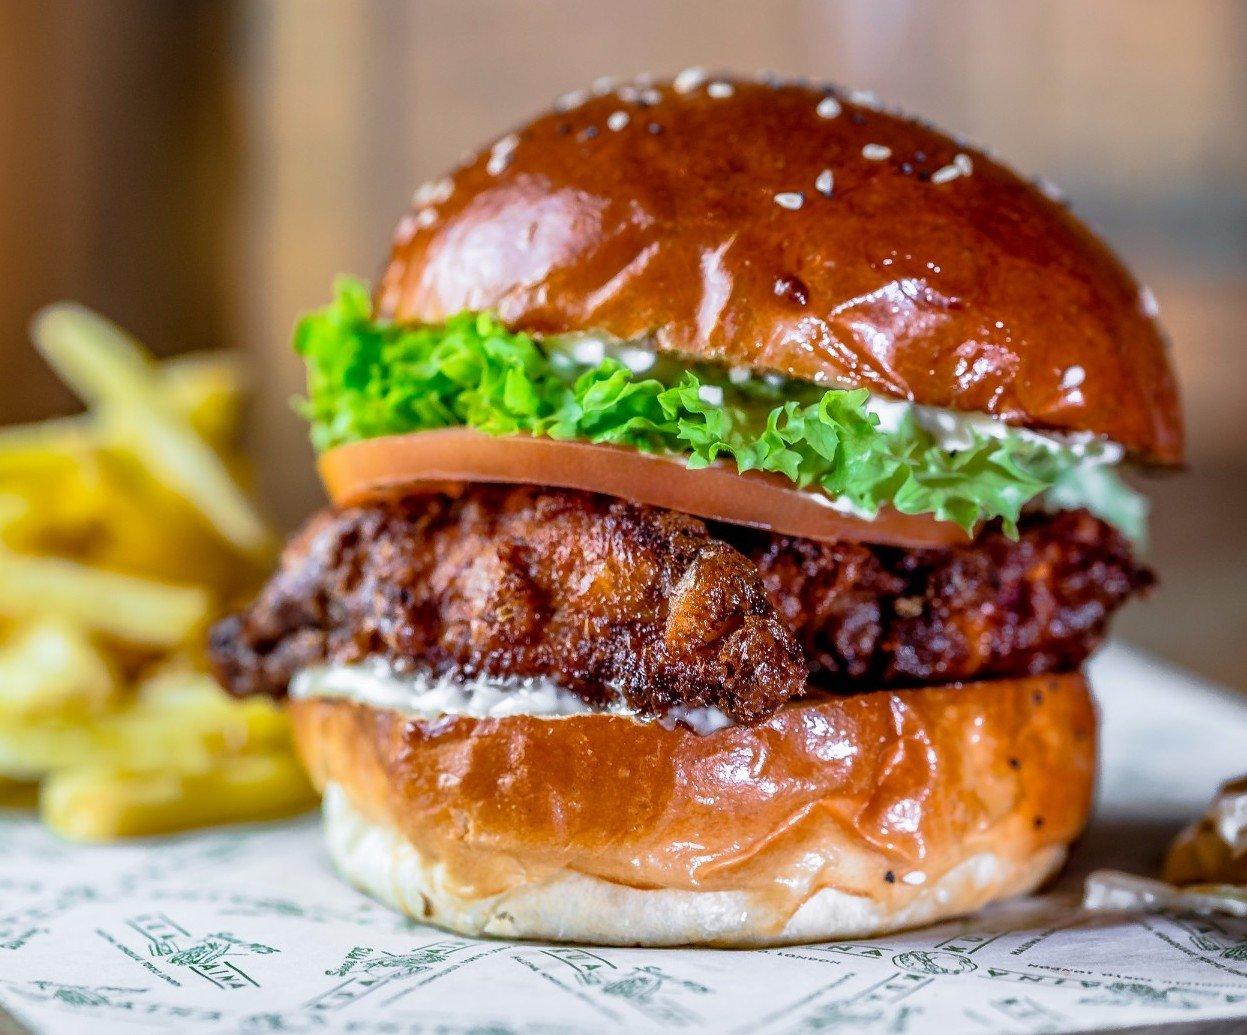 City Pantry - Best burgers in London - Kua 'Aina